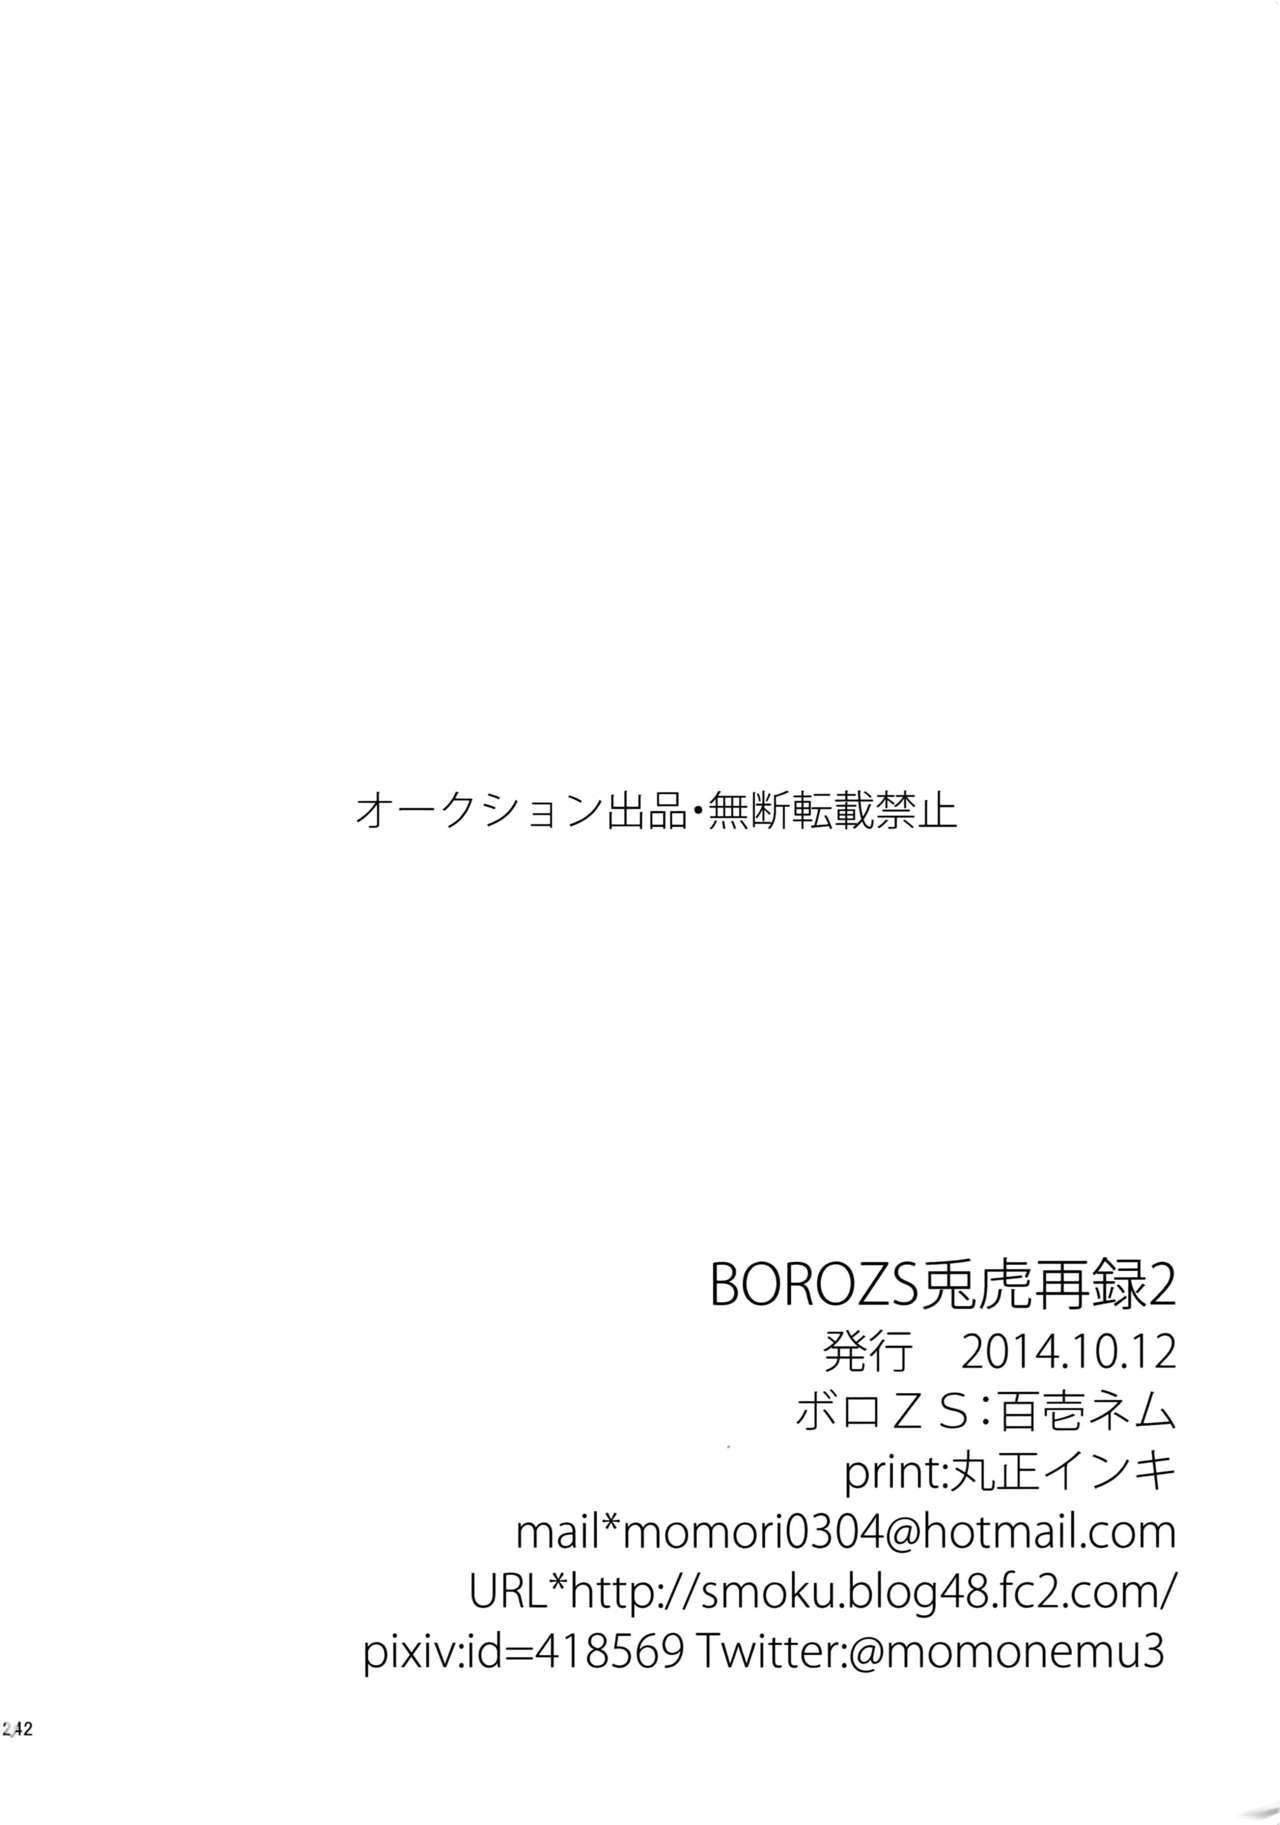 BOROZS Usagi Tora Sairoku 2 240